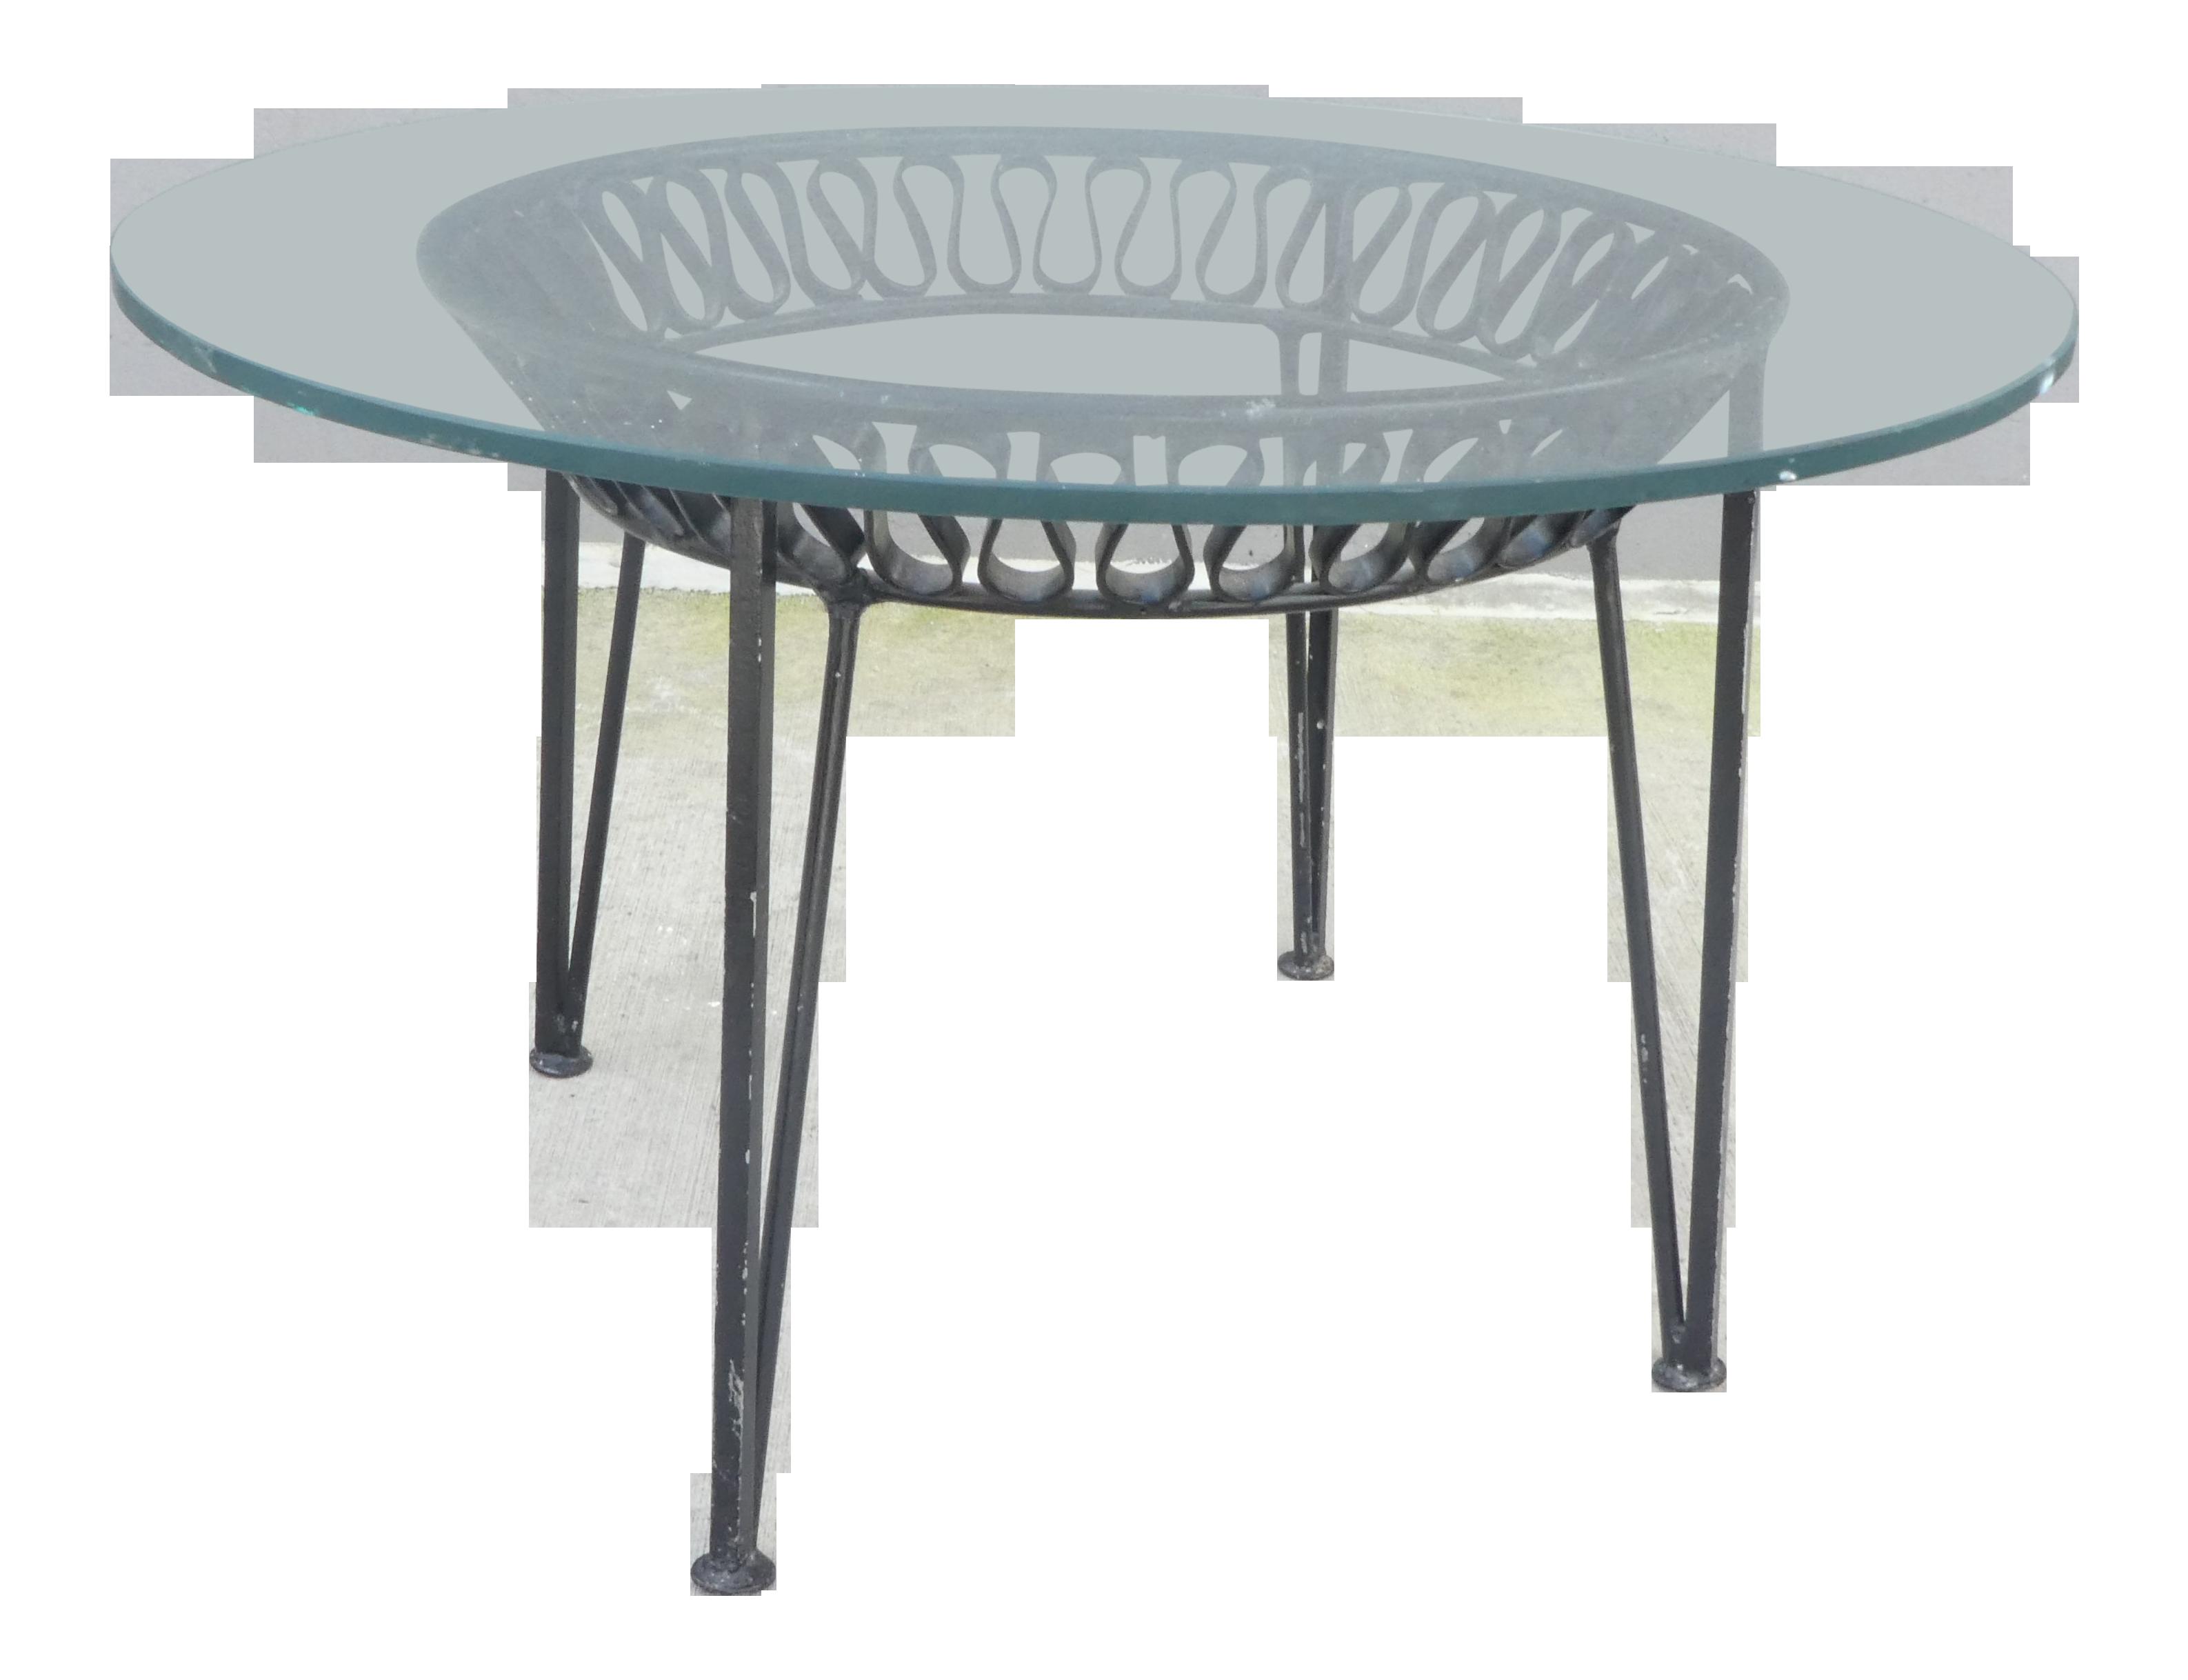 Gentil 1950s Mid Century Modern Maurizio Tempestini For Salterini Ribbon Side Table